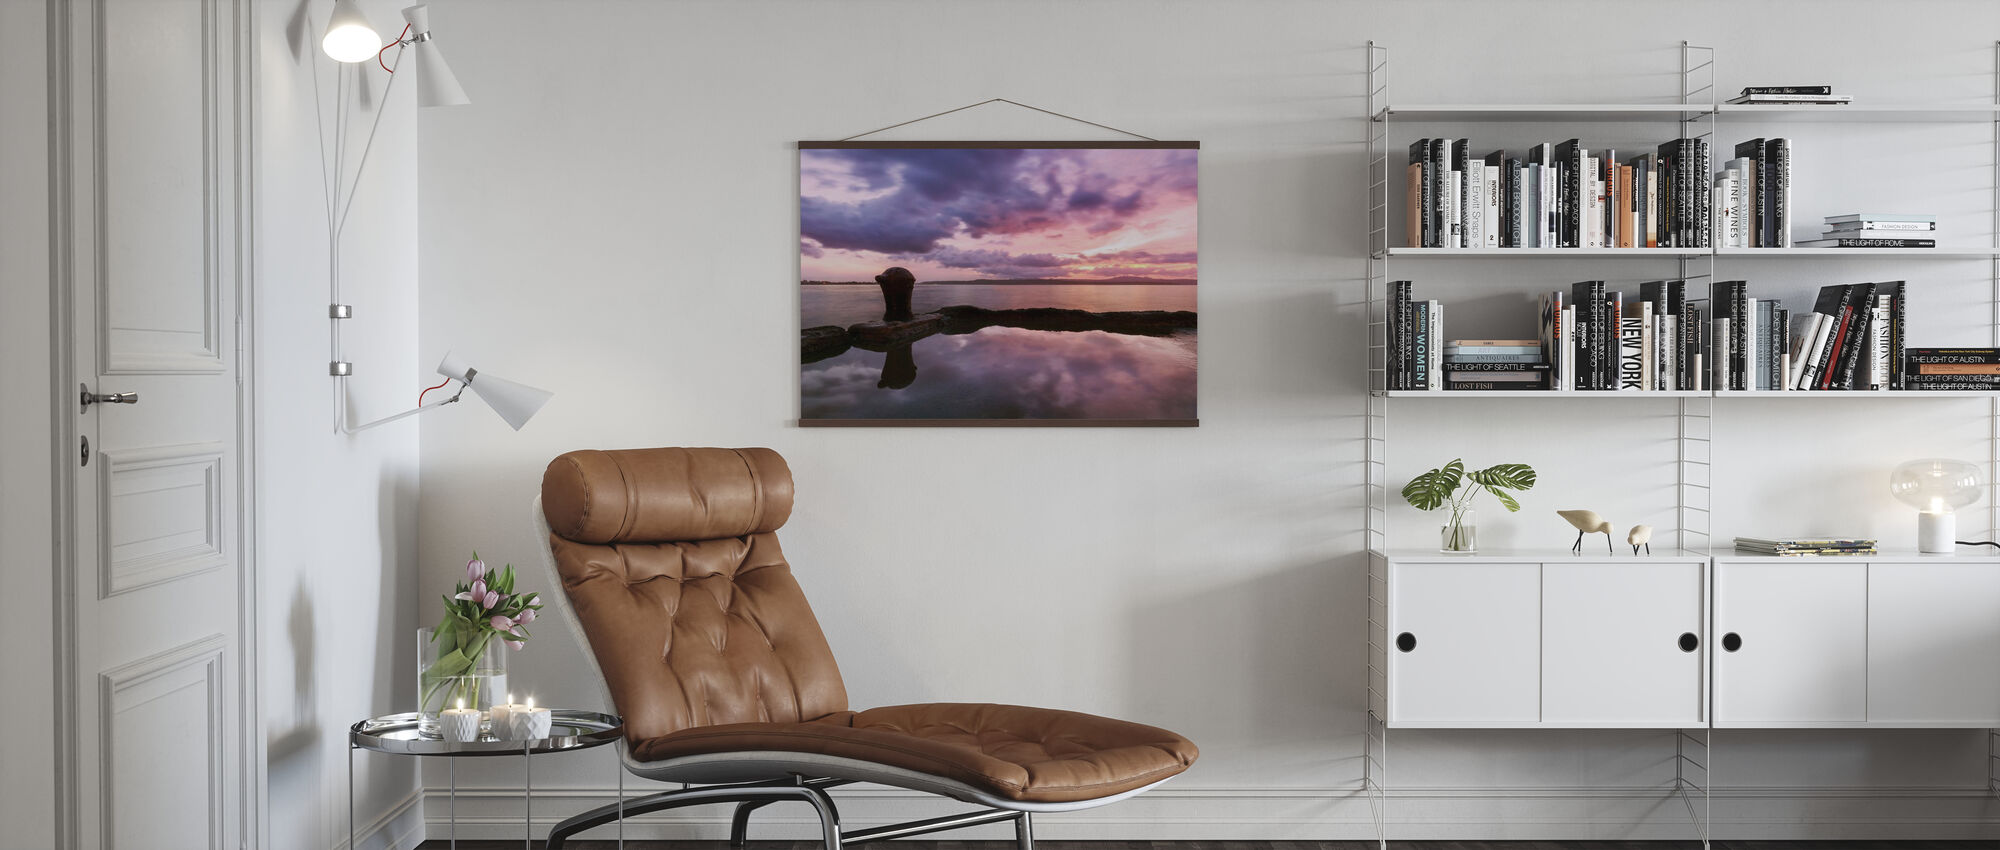 Colorful Sunrise in Santa Davao - Poster - Living Room